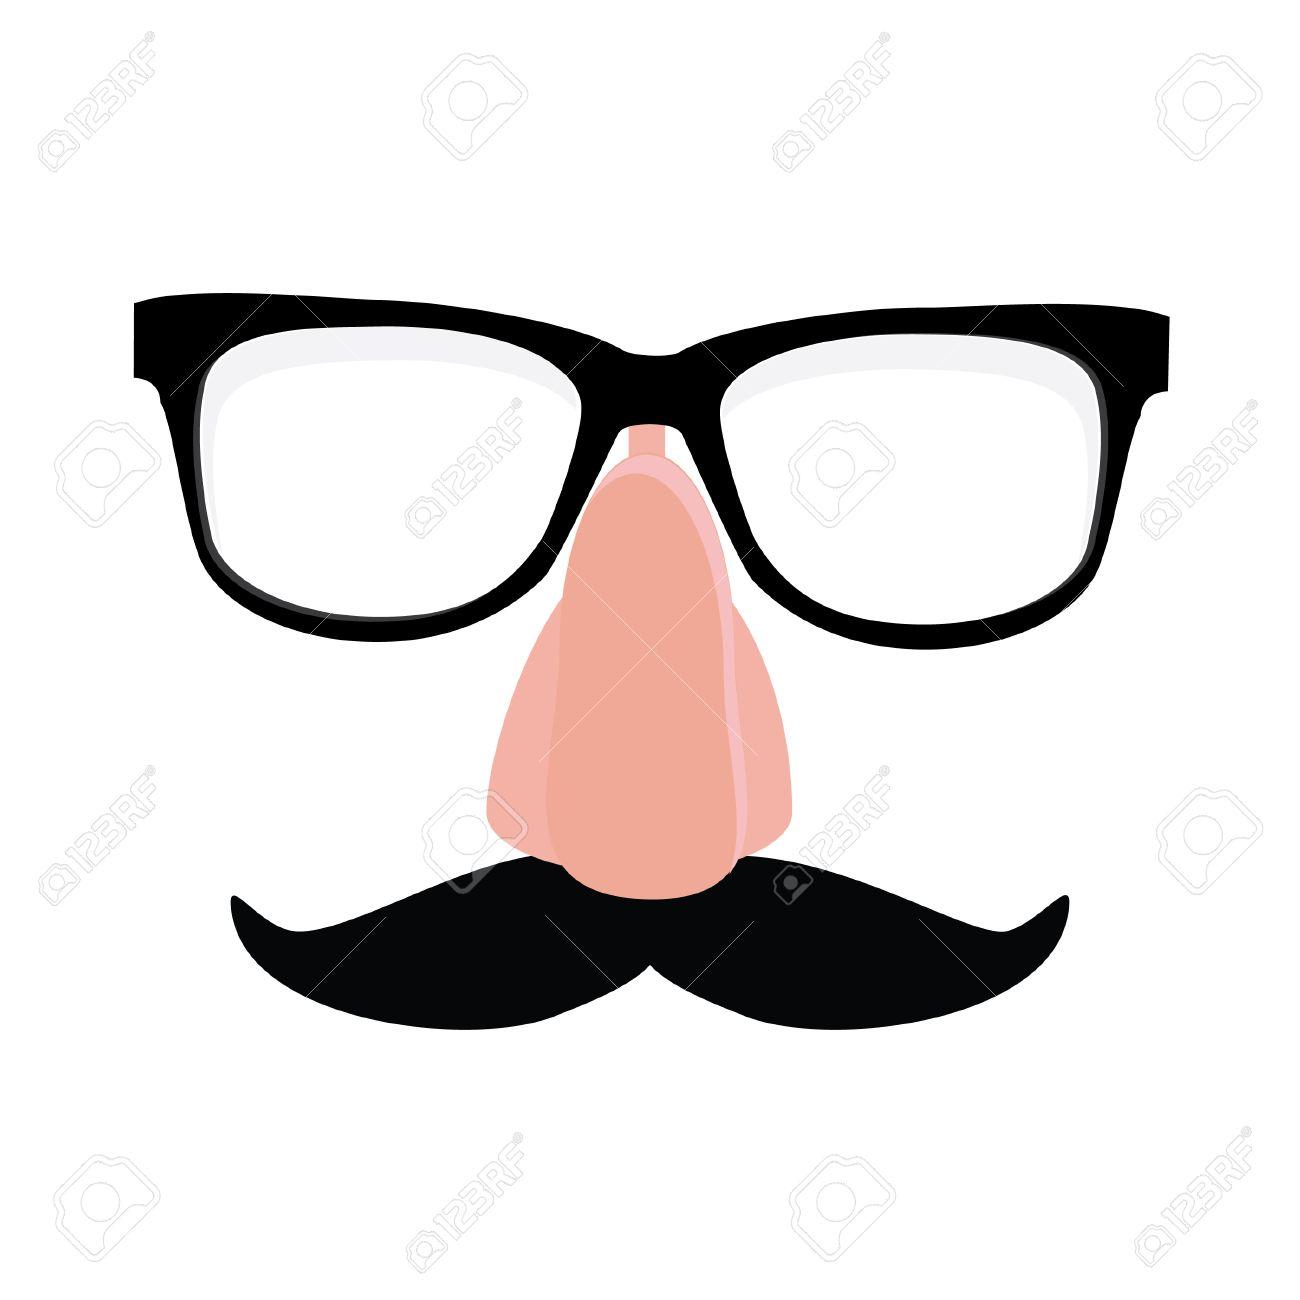 55cfe429c961 Fake nose and glasses humor mask raster illustration. Disguise glasses